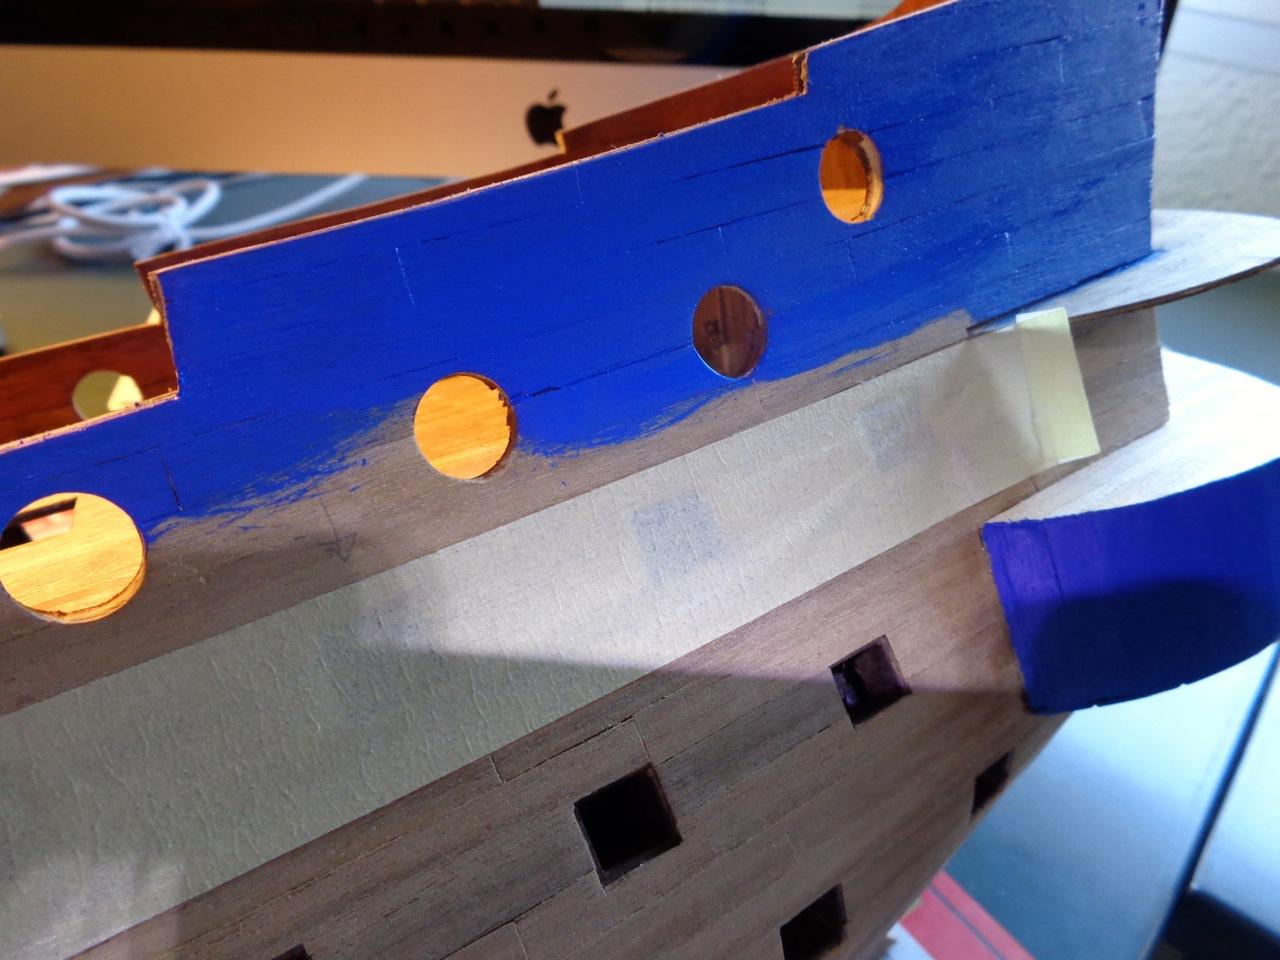 http://www.carlosys.com/blog/images/sfelipe/DSC00602.jpg